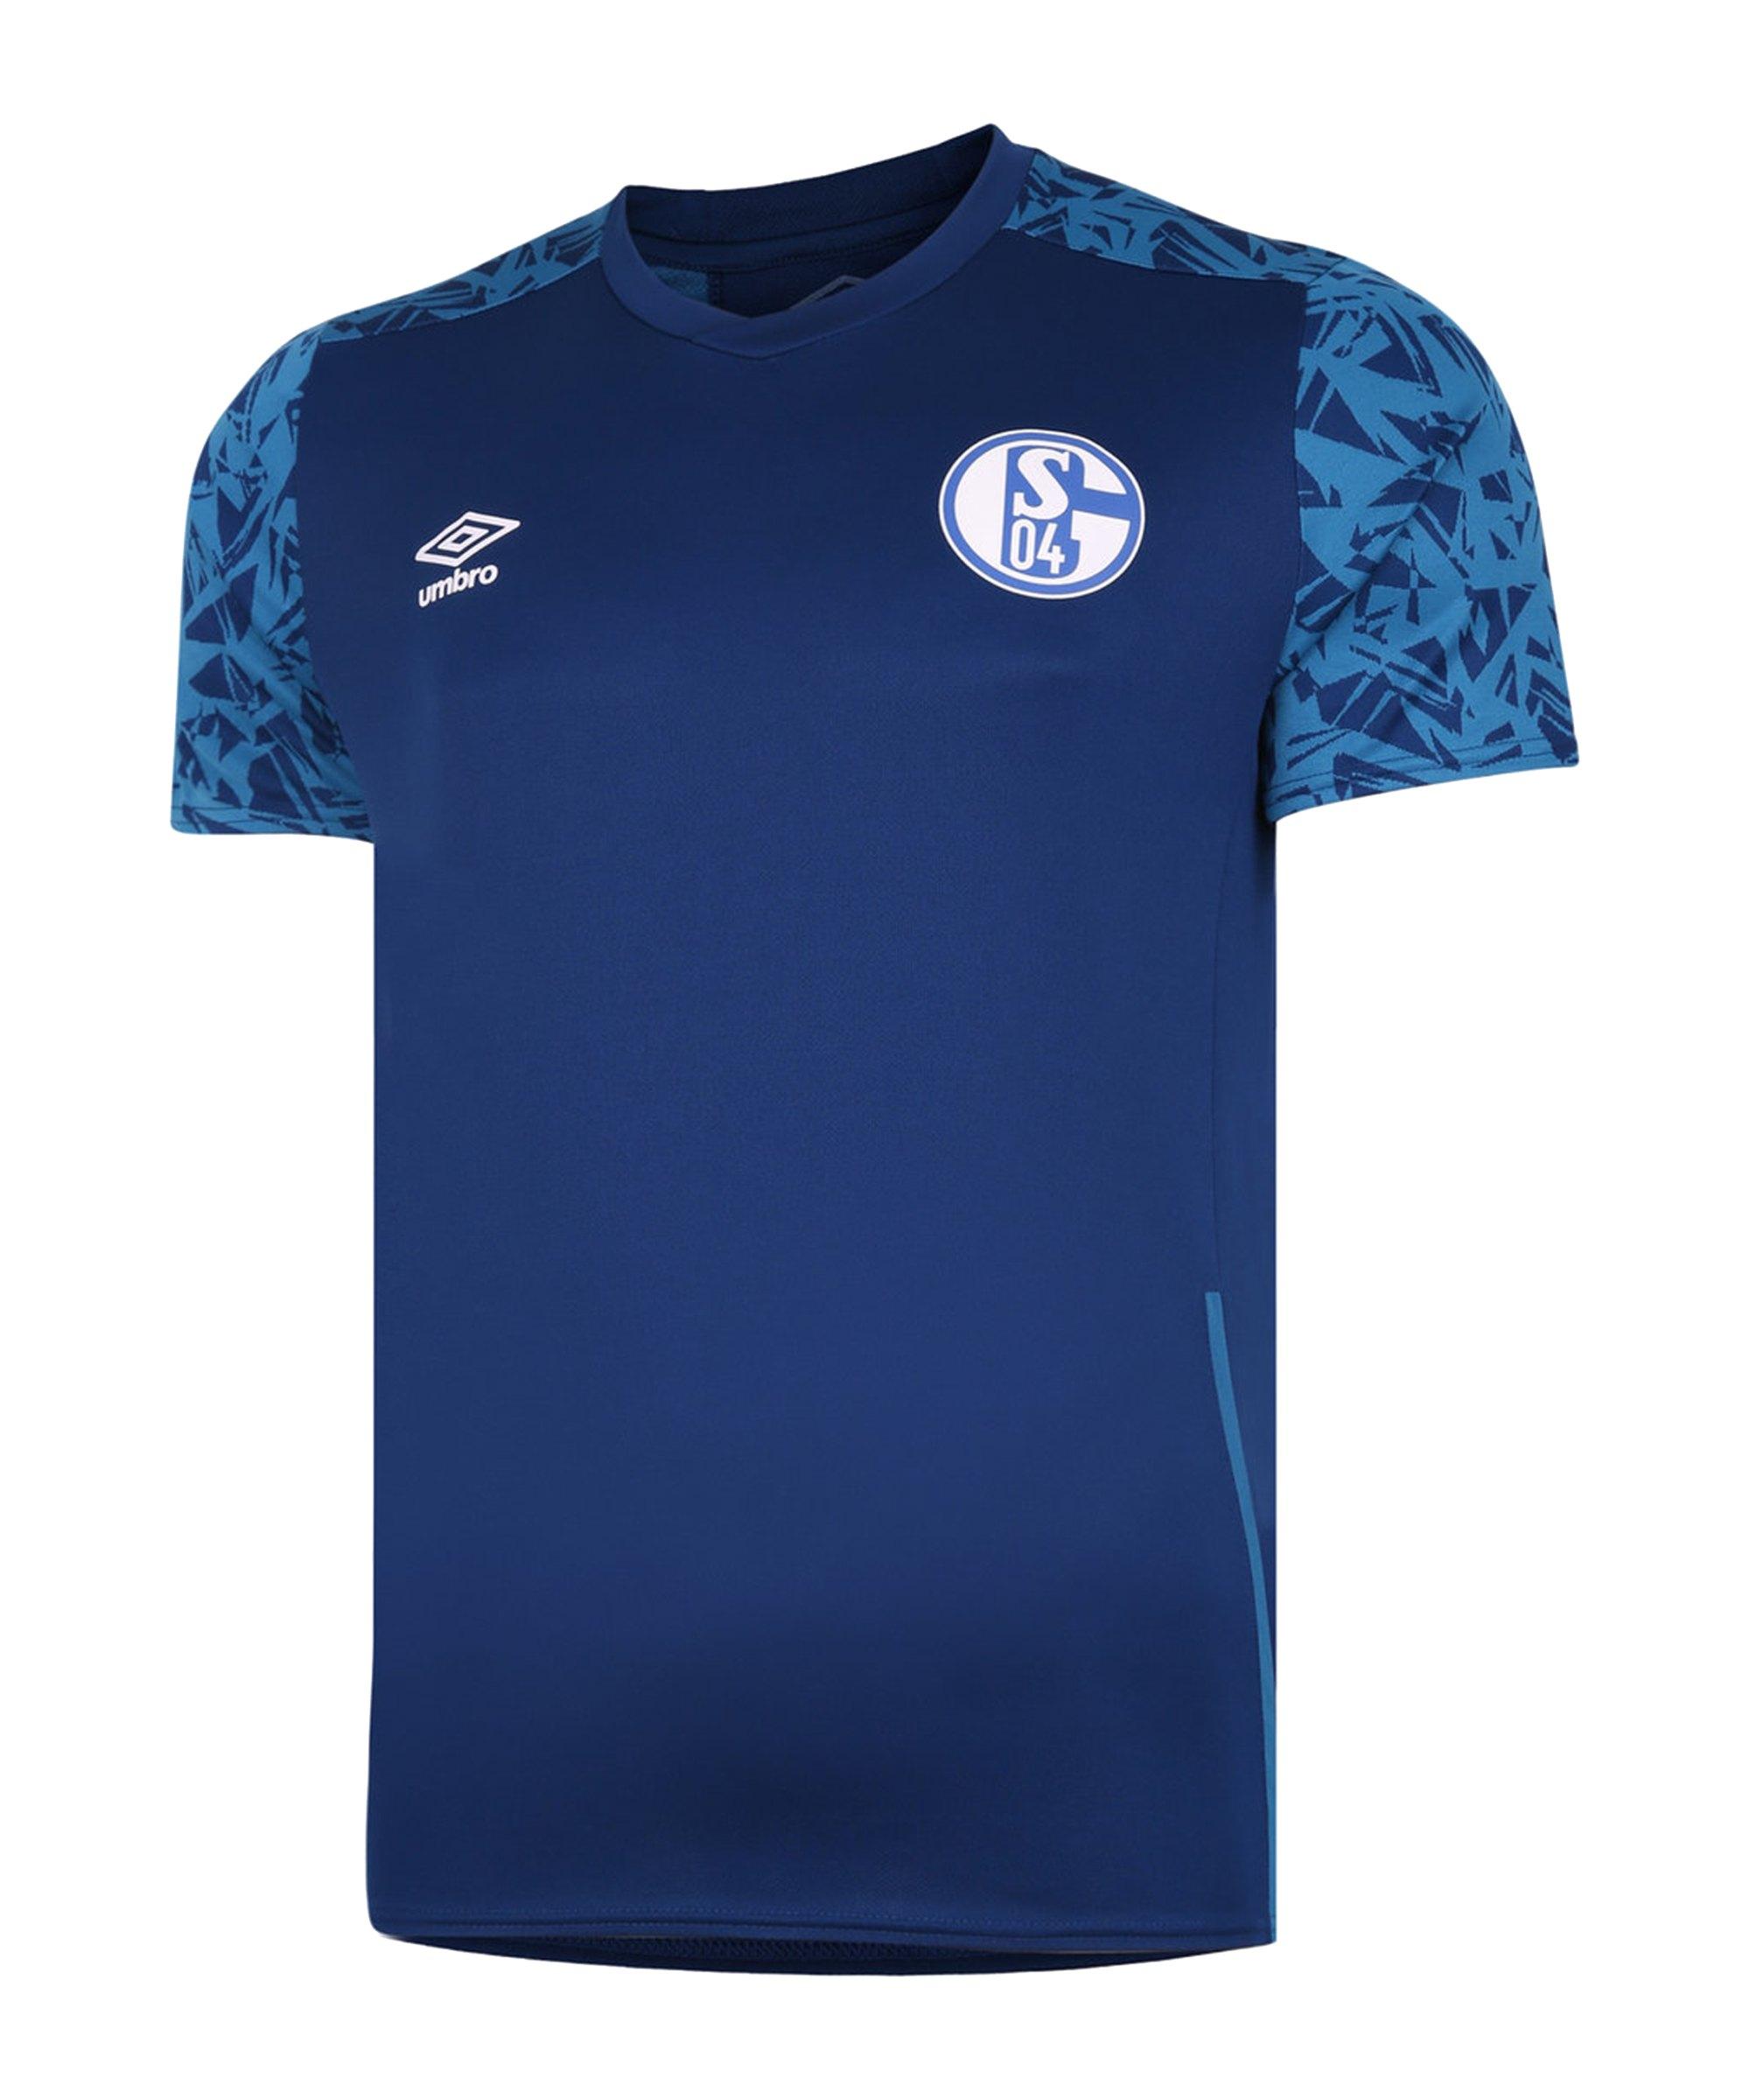 Umbro FC Schalke 04 Trainingsshirt Blau FJRE - blau